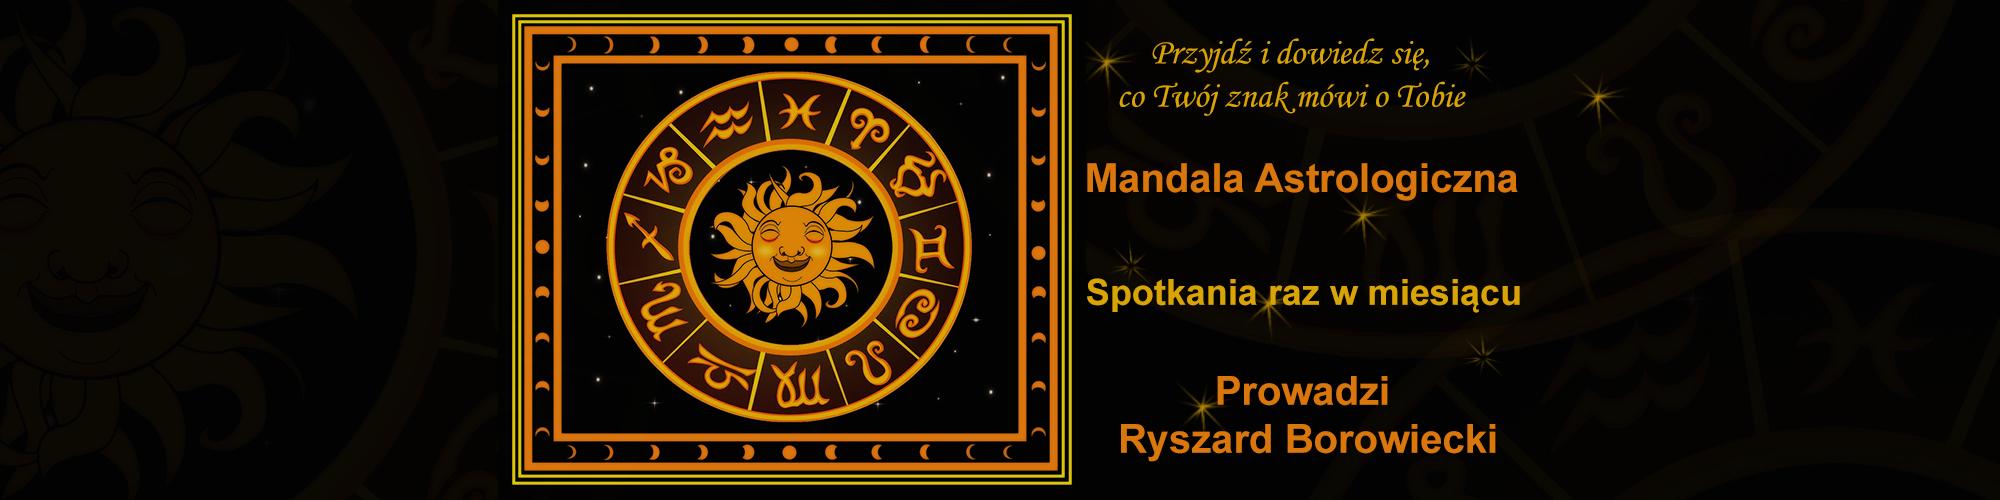 mandalaastro-banner